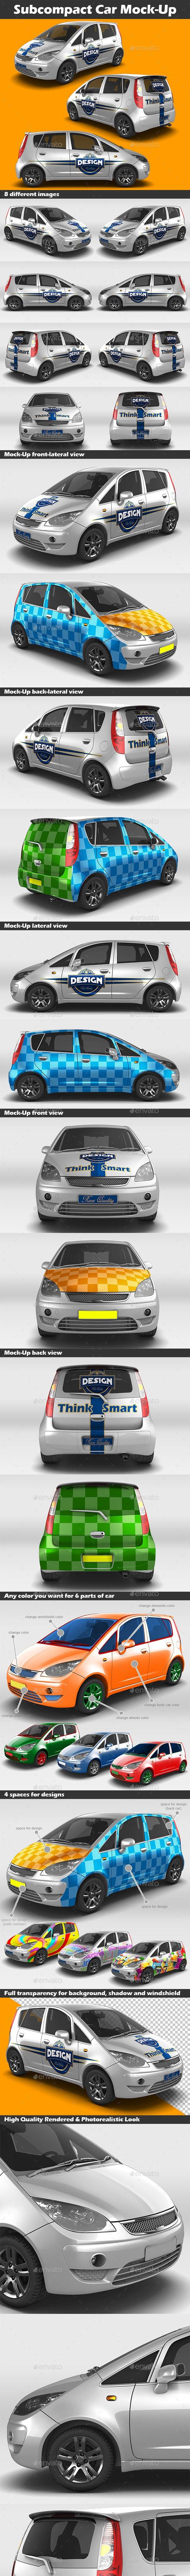 Subcompact Car Mock-Up - Vehicle Wraps Print